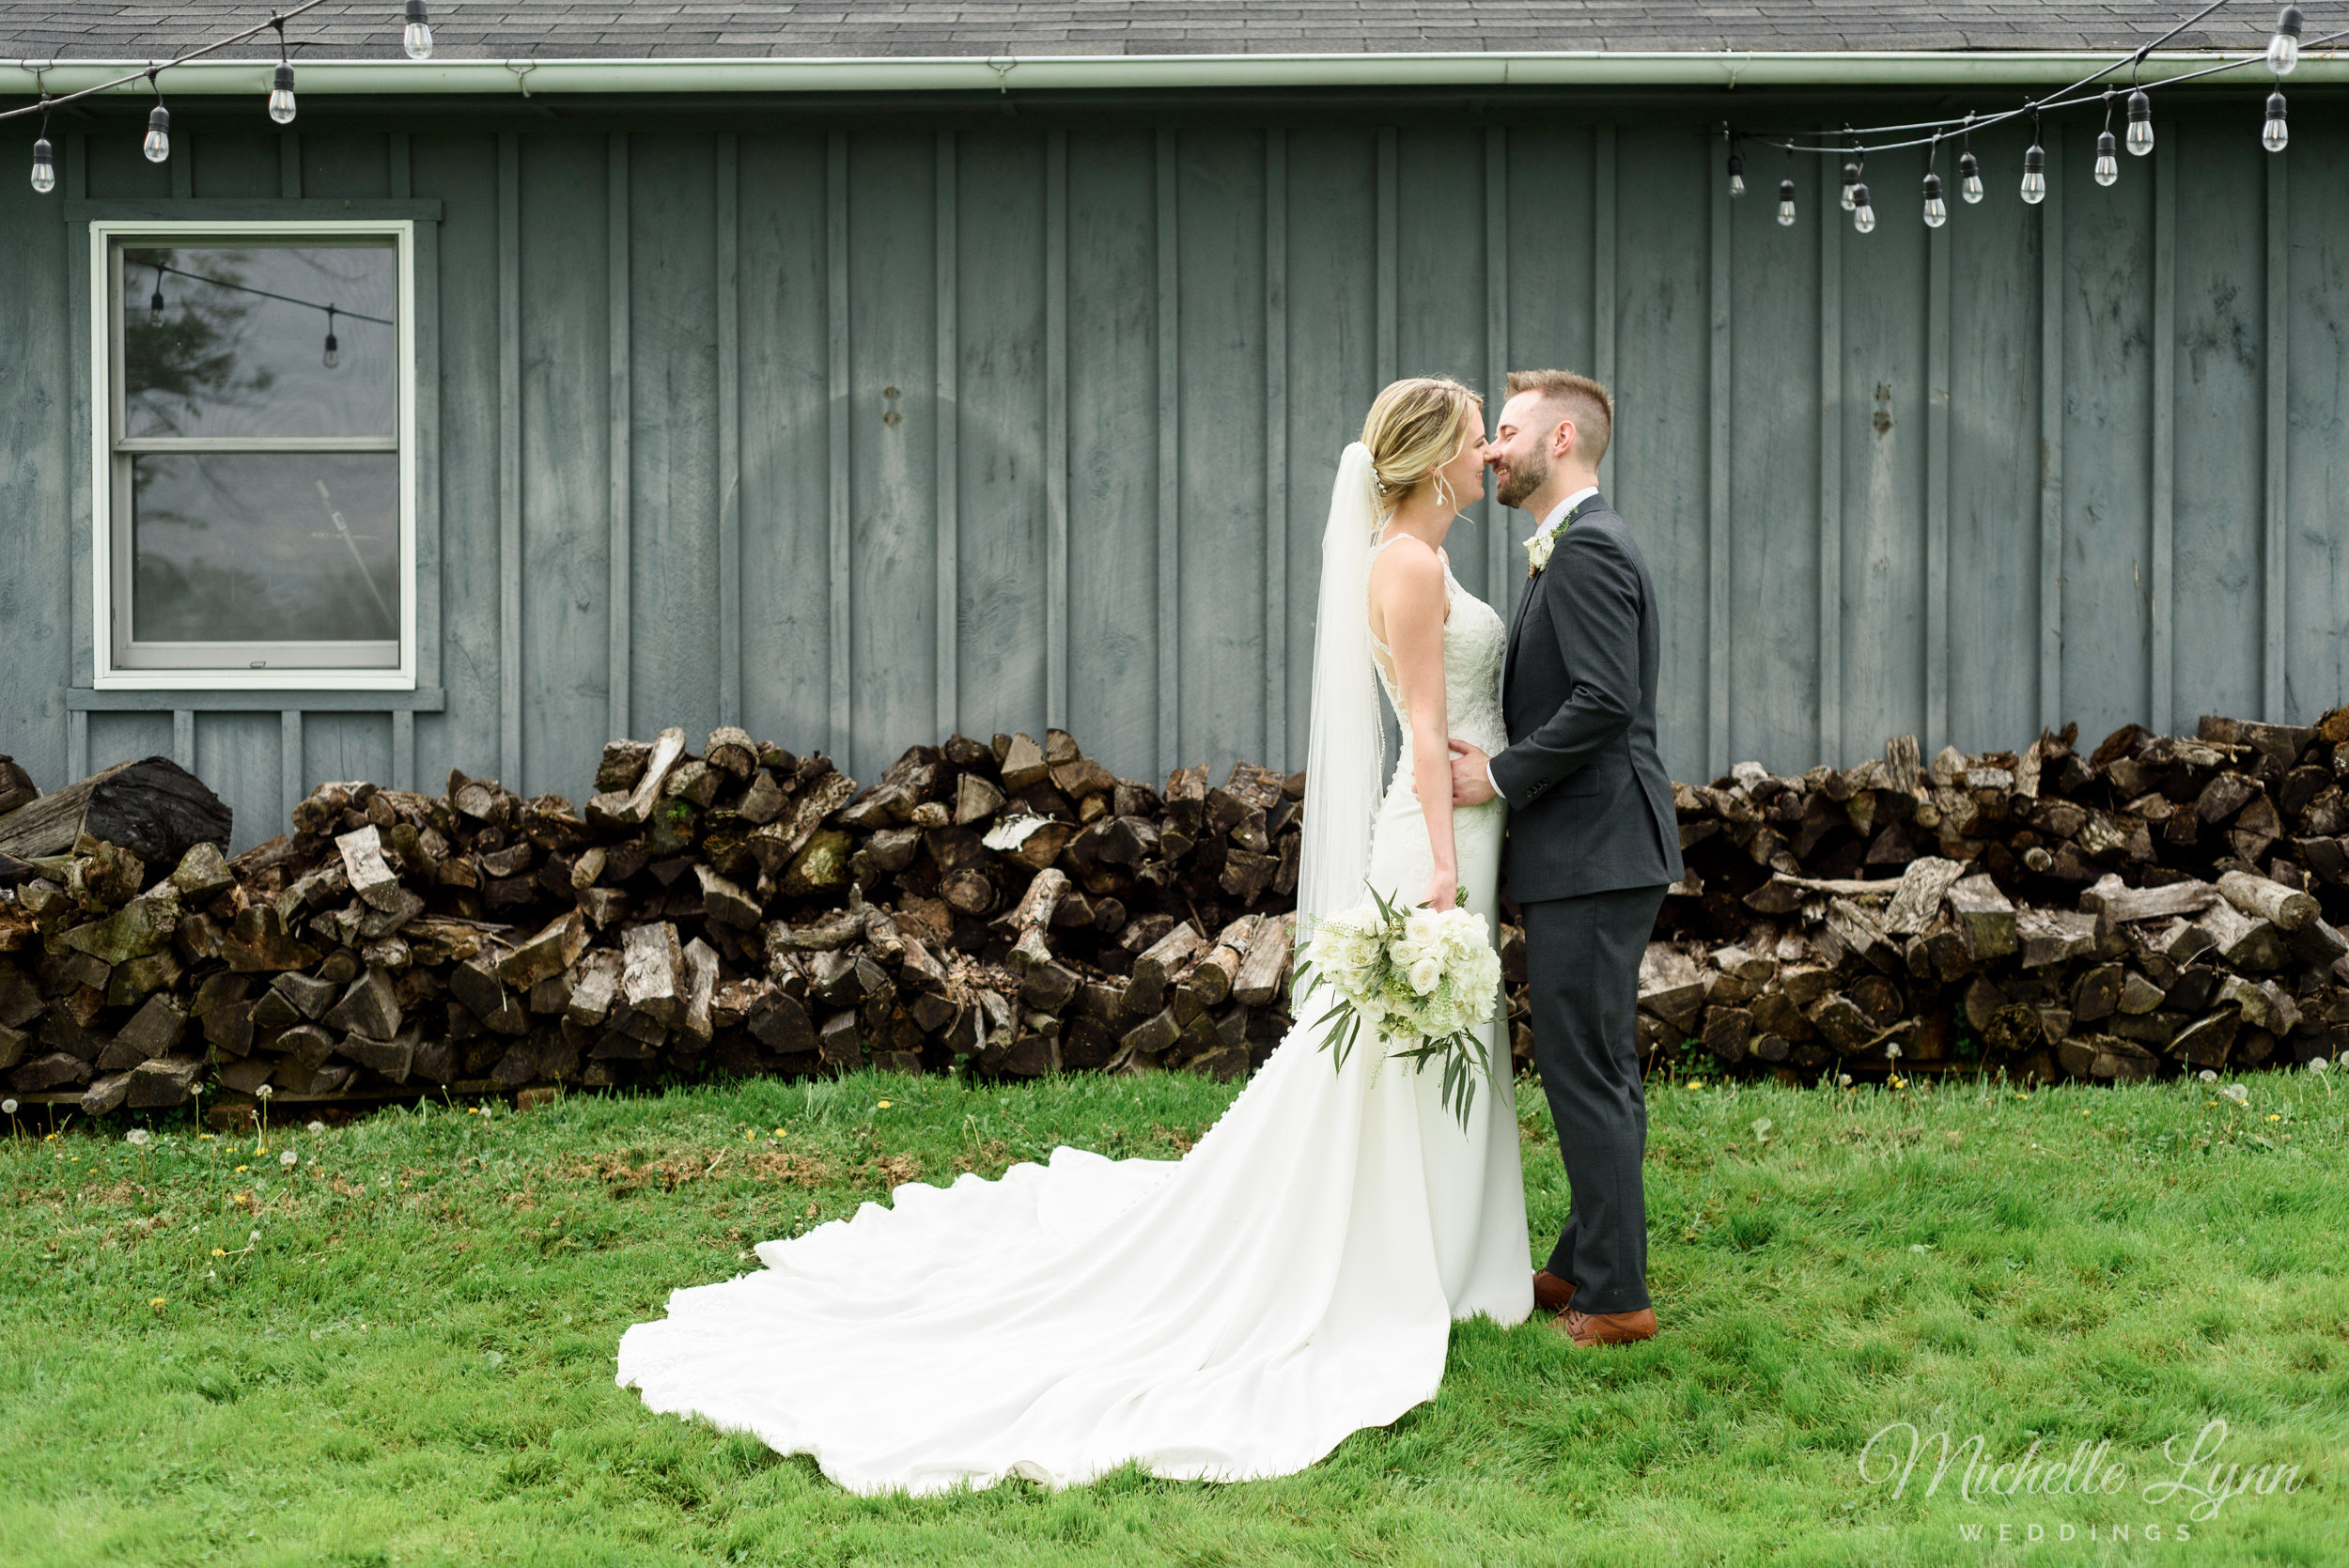 mlw-the-farm-bakery-and-events-wedding-photos-52.jpg